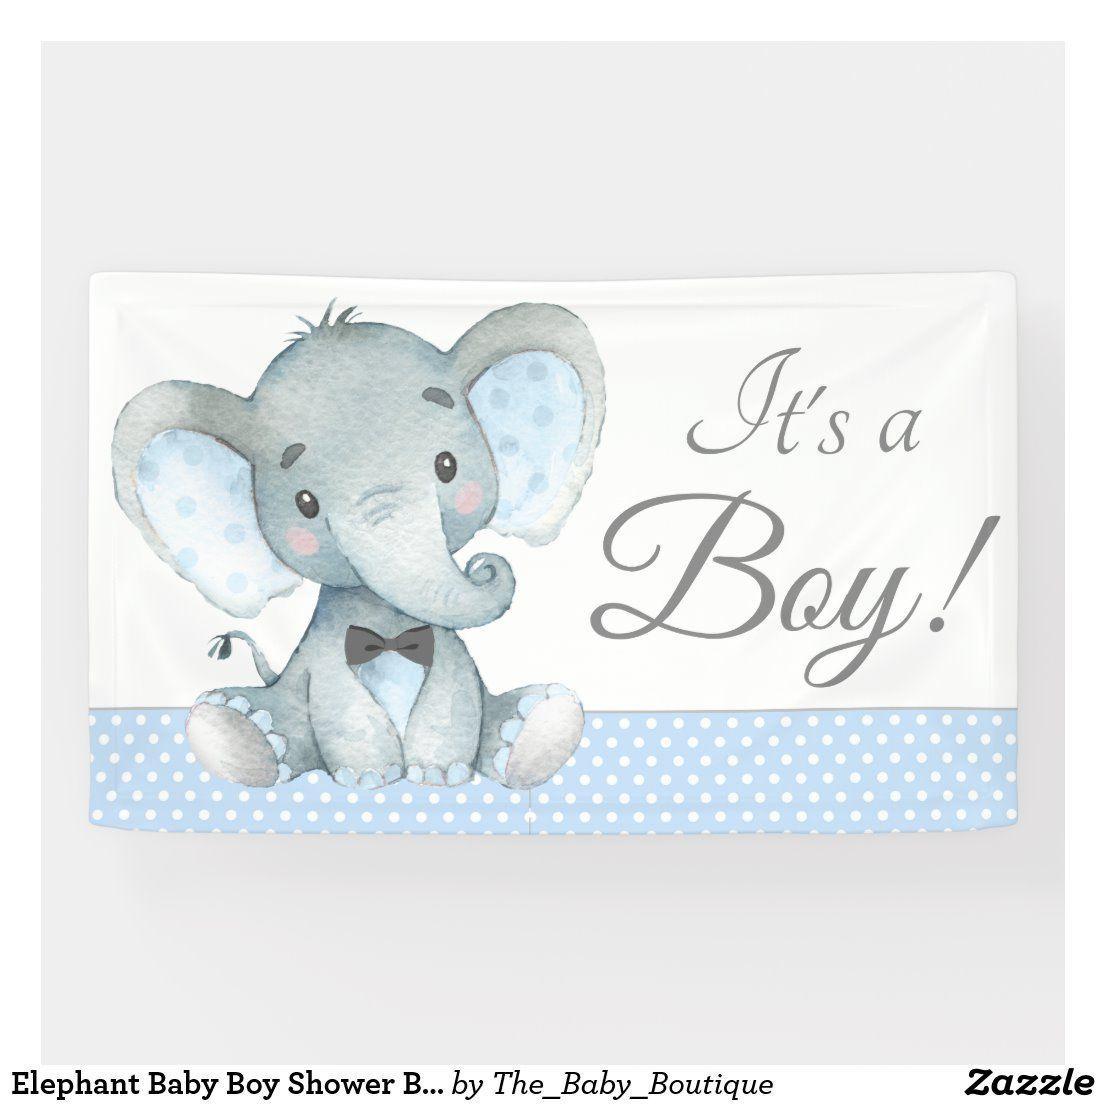 Elephant Baby Boy Shower Banners Zazzle Com In 2020 Elephant Baby Shower Banner Baby Shower Banner Boy Elephant Baby Boy